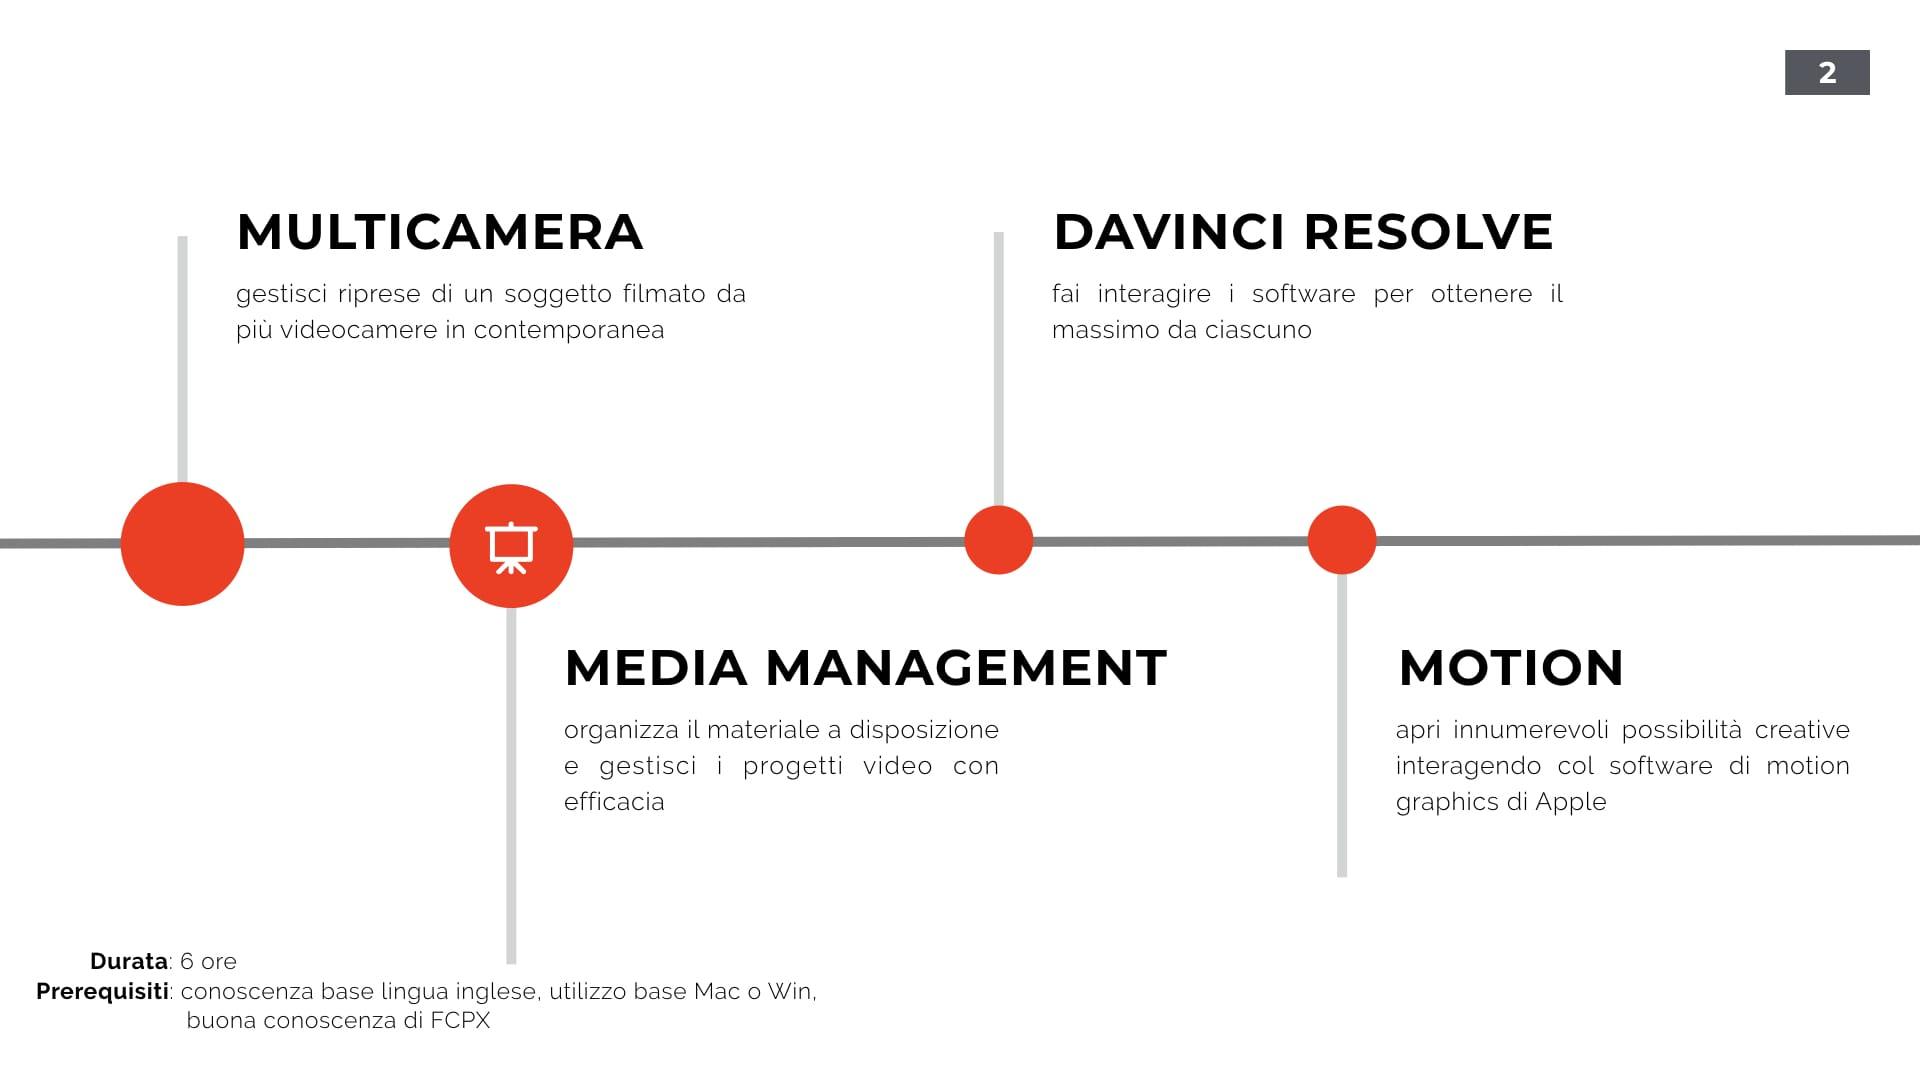 final-cut-pro-x-adv-editing-media-management